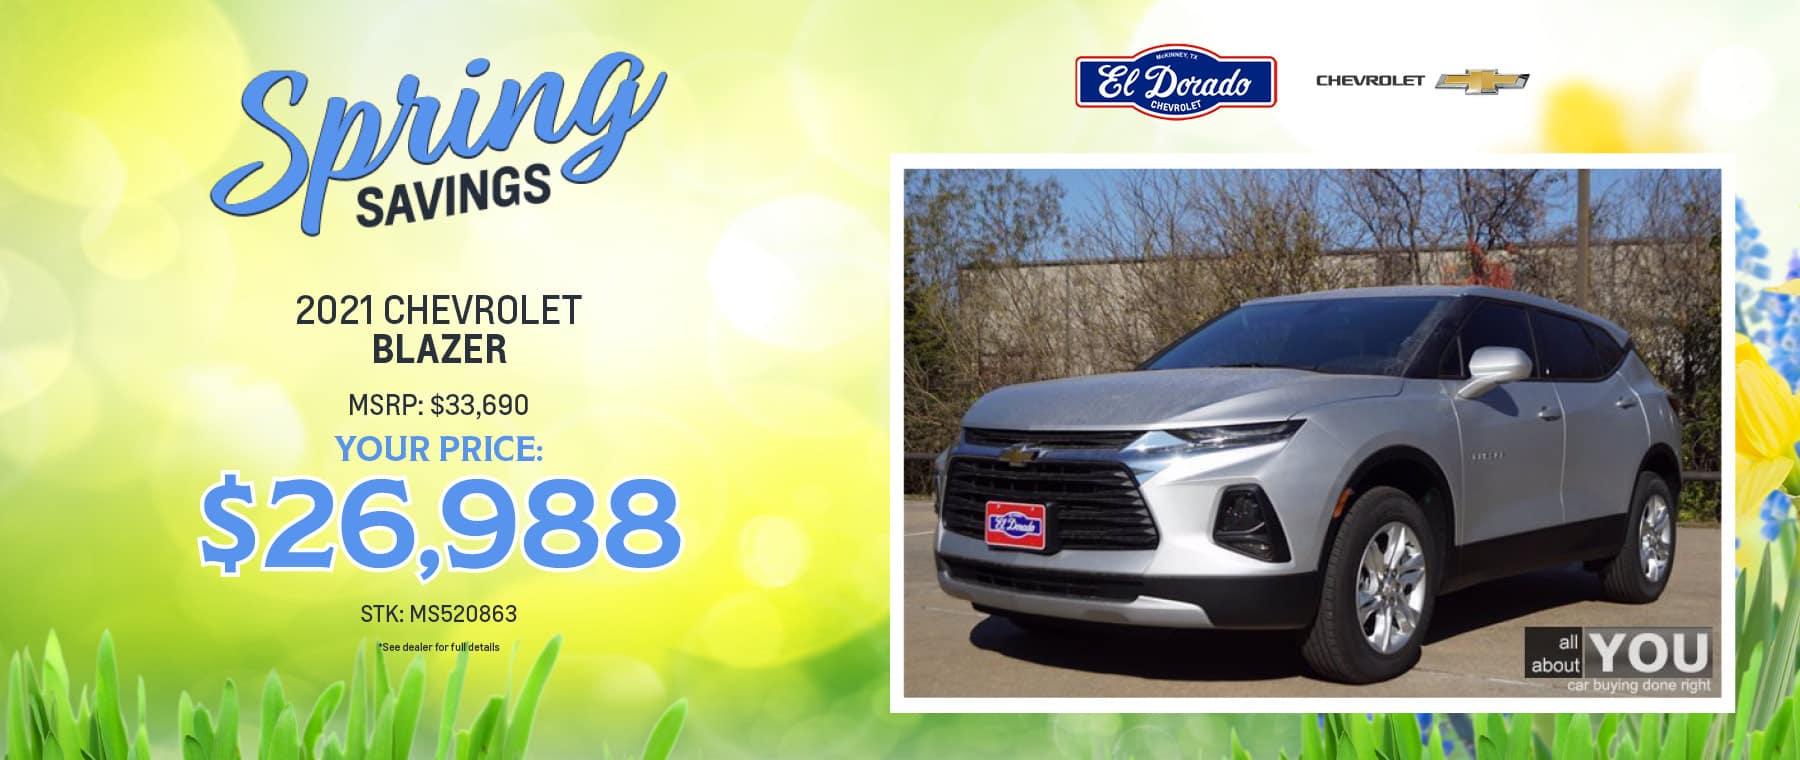 2021 Chevrolet Blazer Offer - El Dorado Chevrolet in McKinney, Texas